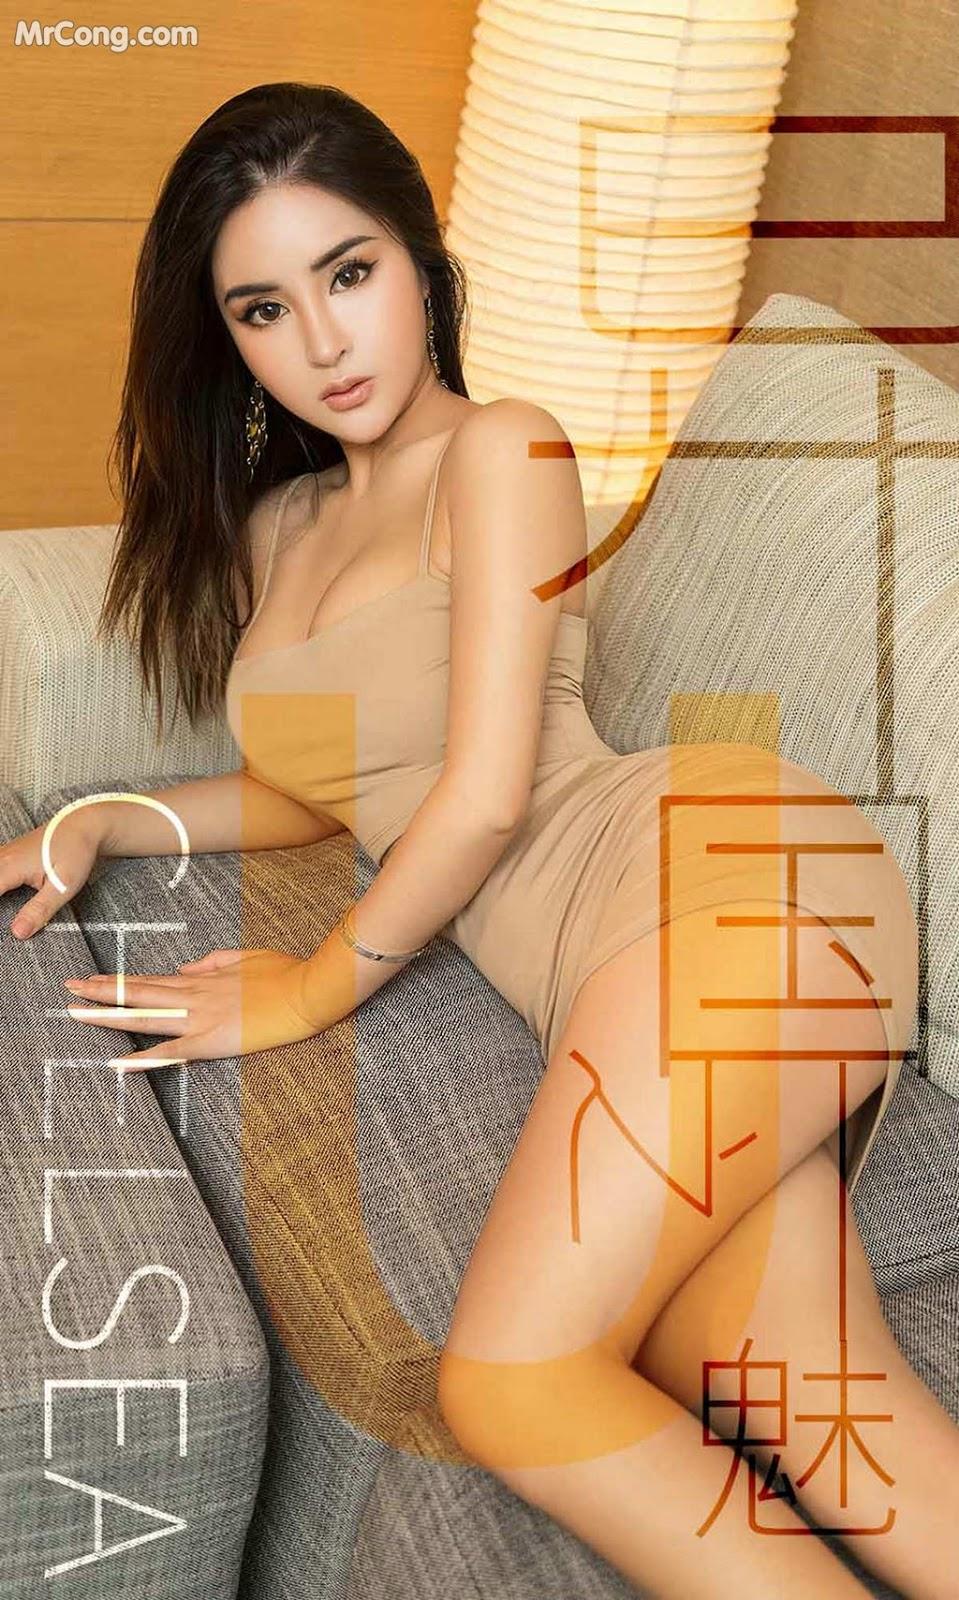 Image UGIRLS-Ai-You-Wu-App-No.1421-Chelsea-MrCong.com-001 in post UGIRLS – Ai You Wu App No.1421: Chelsea (35 ảnh)